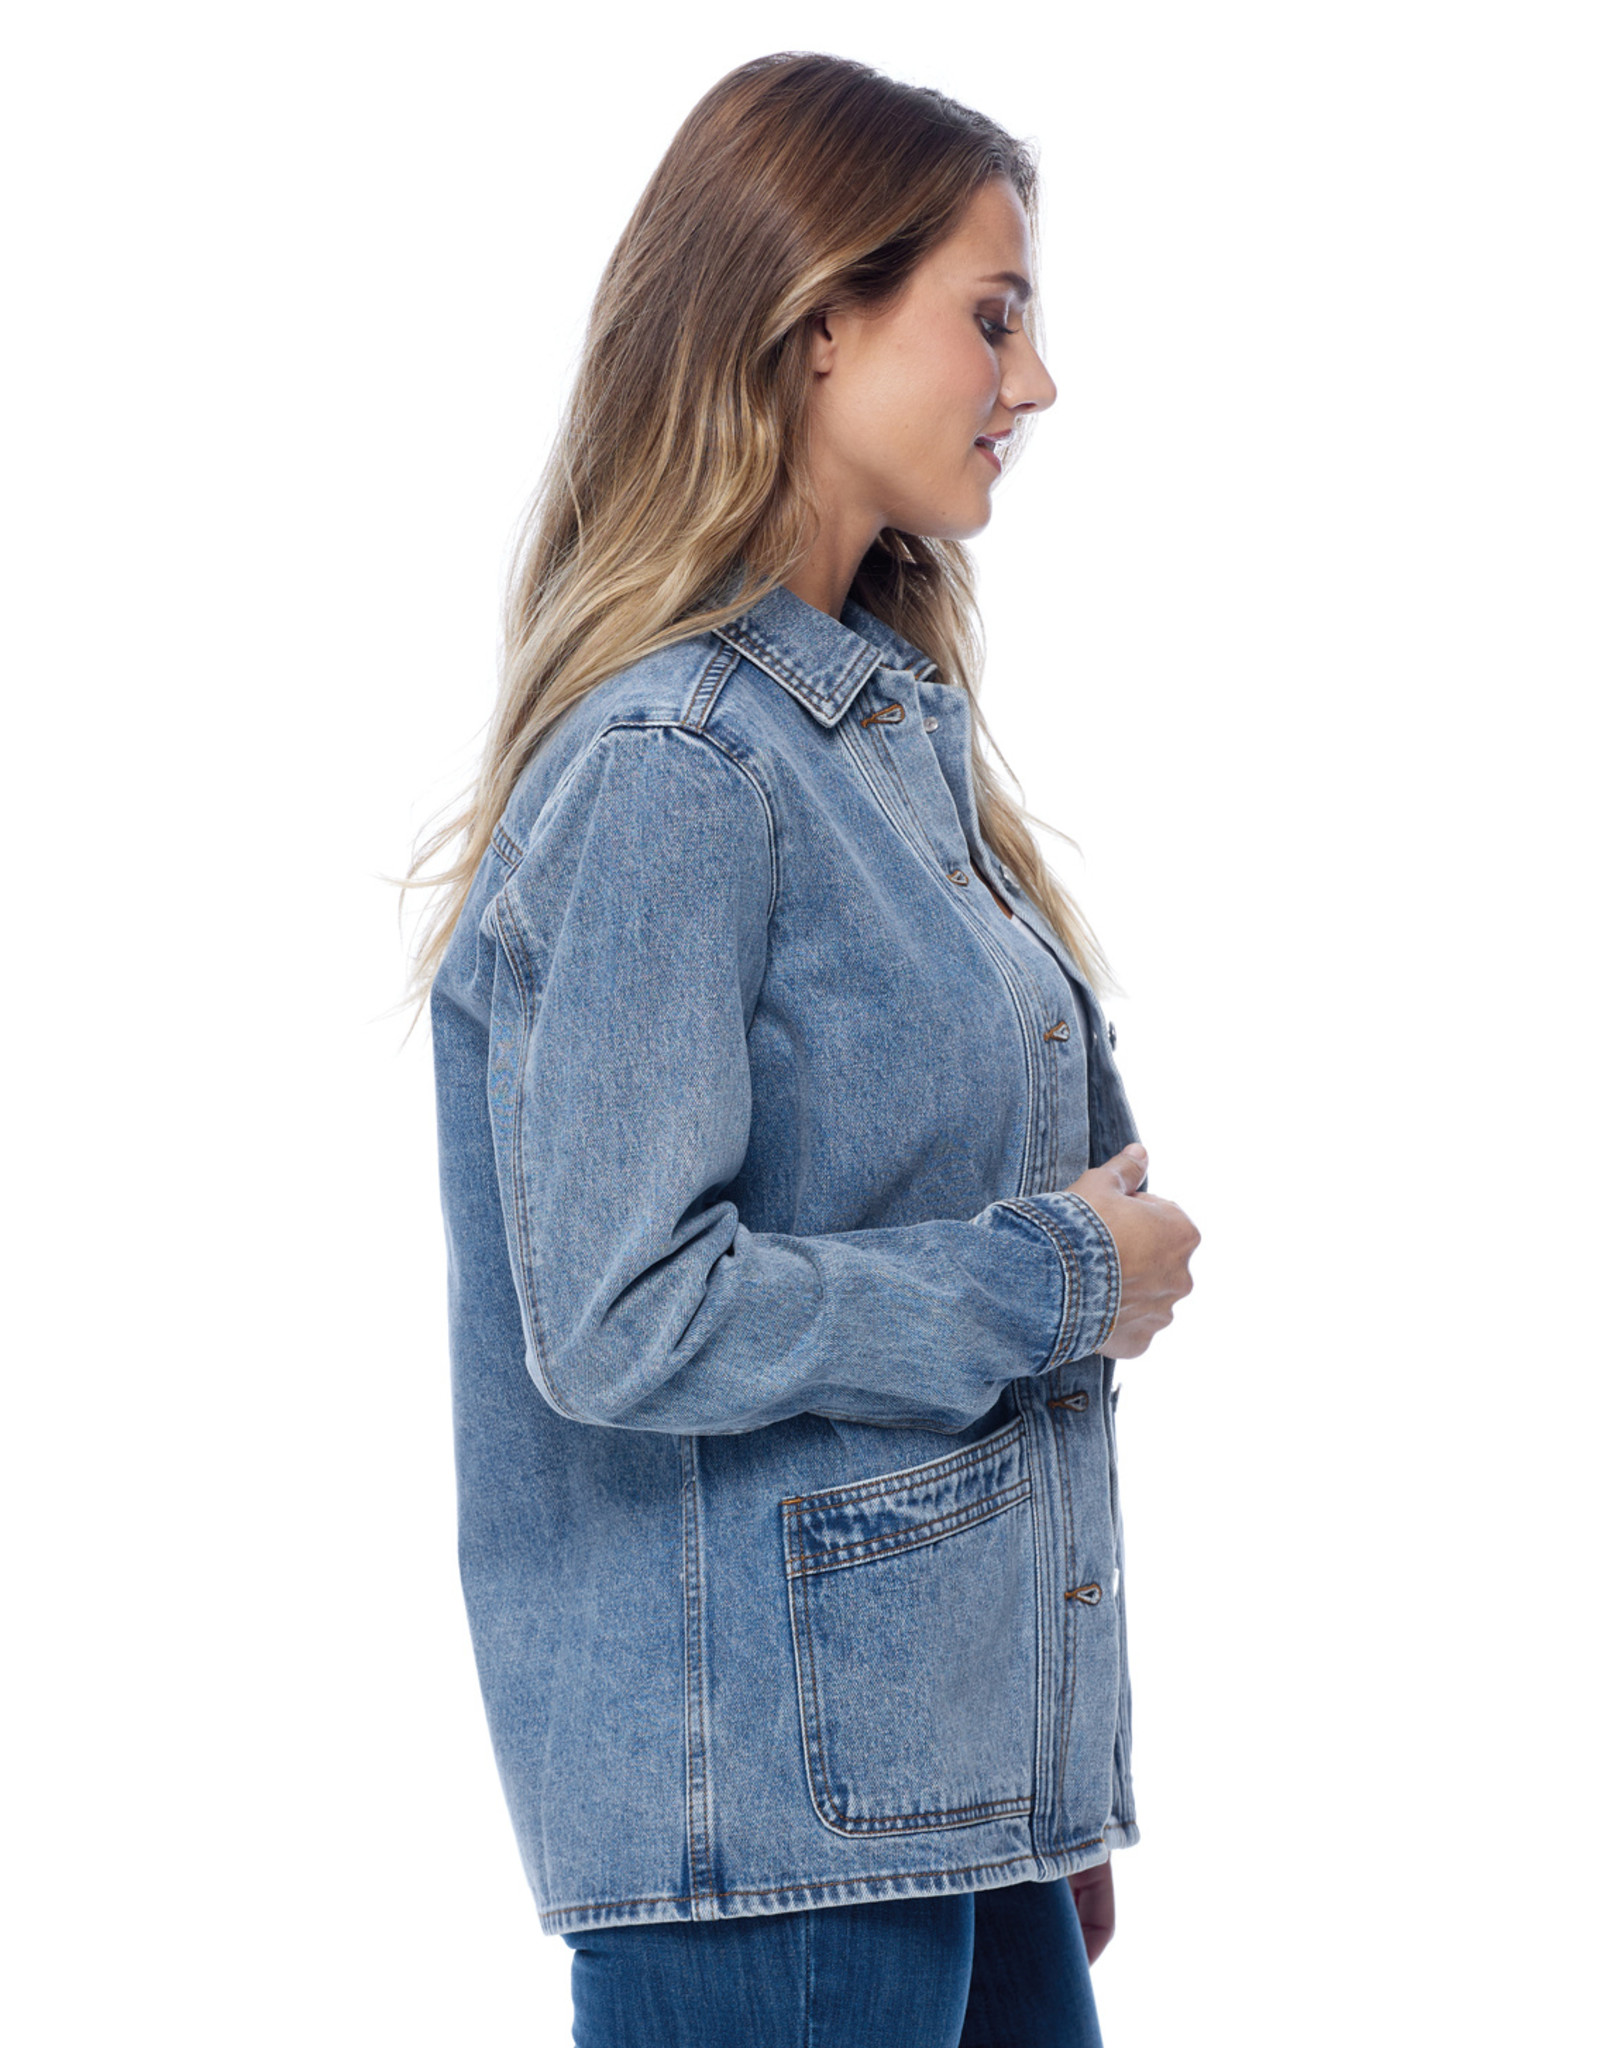 French Dressing Jeans FDJ Denim Artist Smock Jacket 1911585